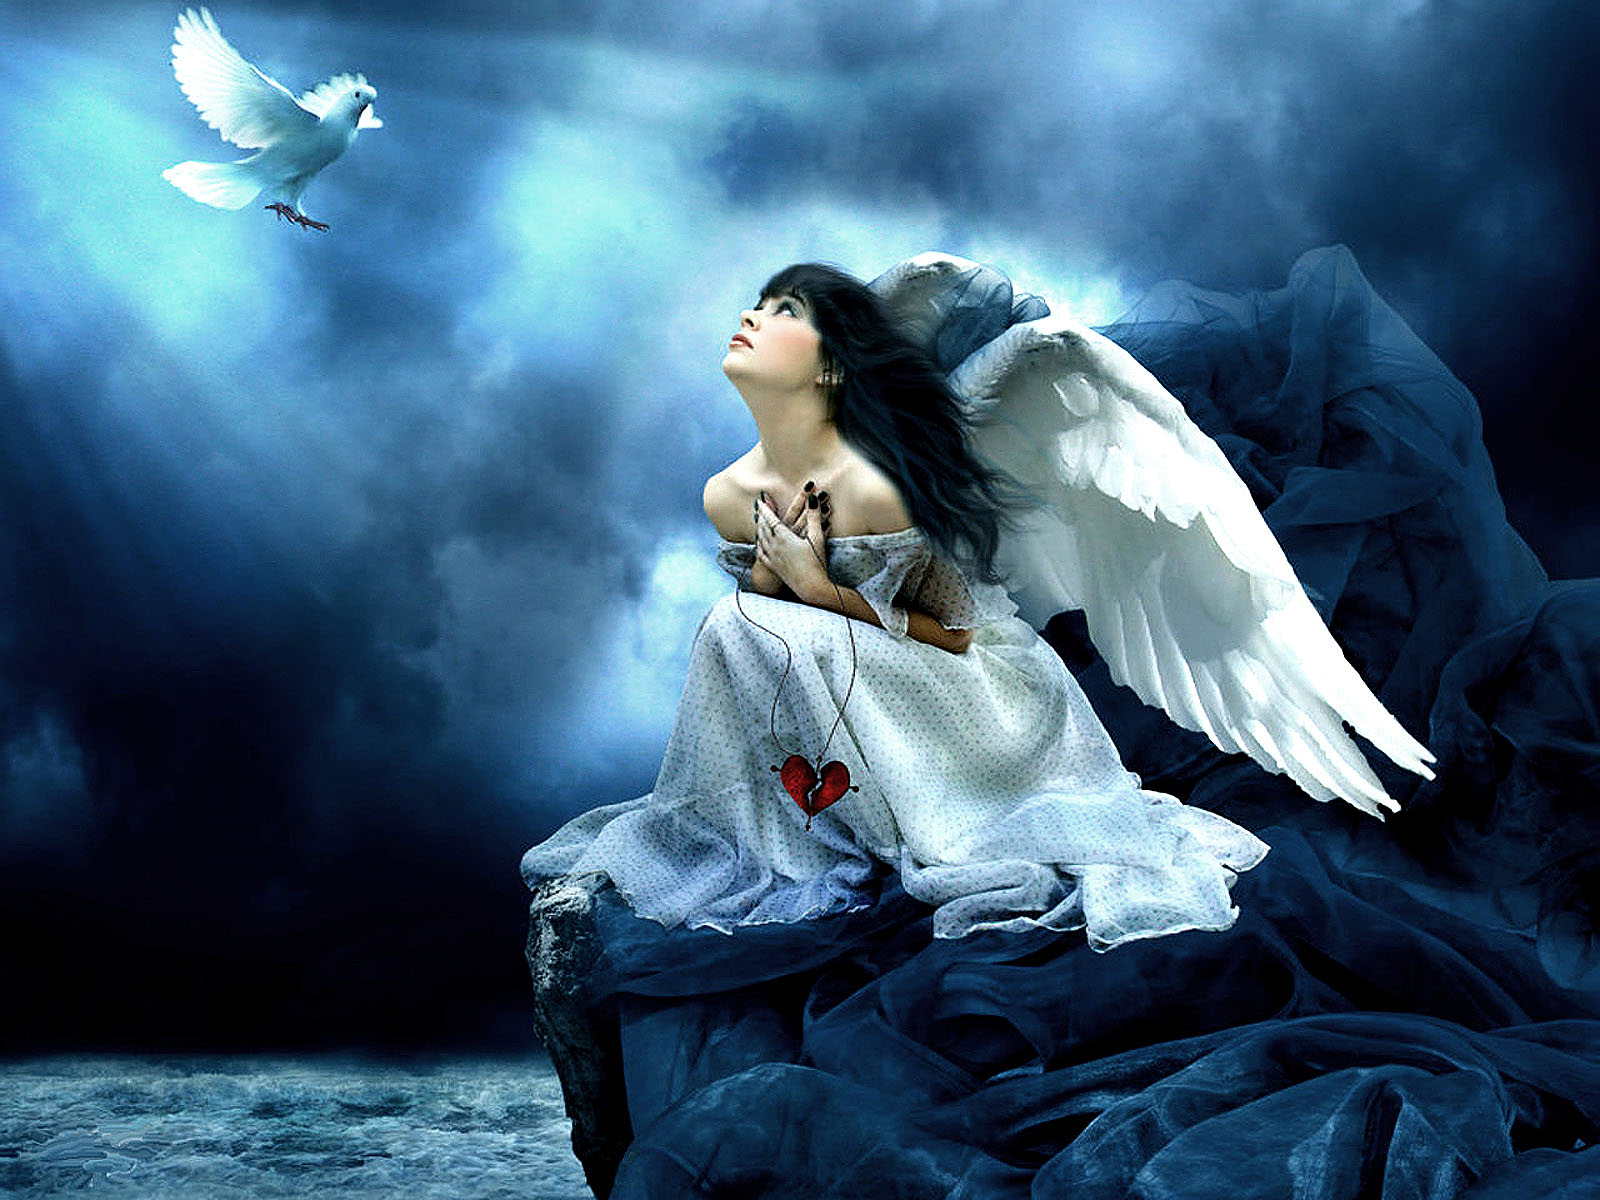 Image result for flying angel